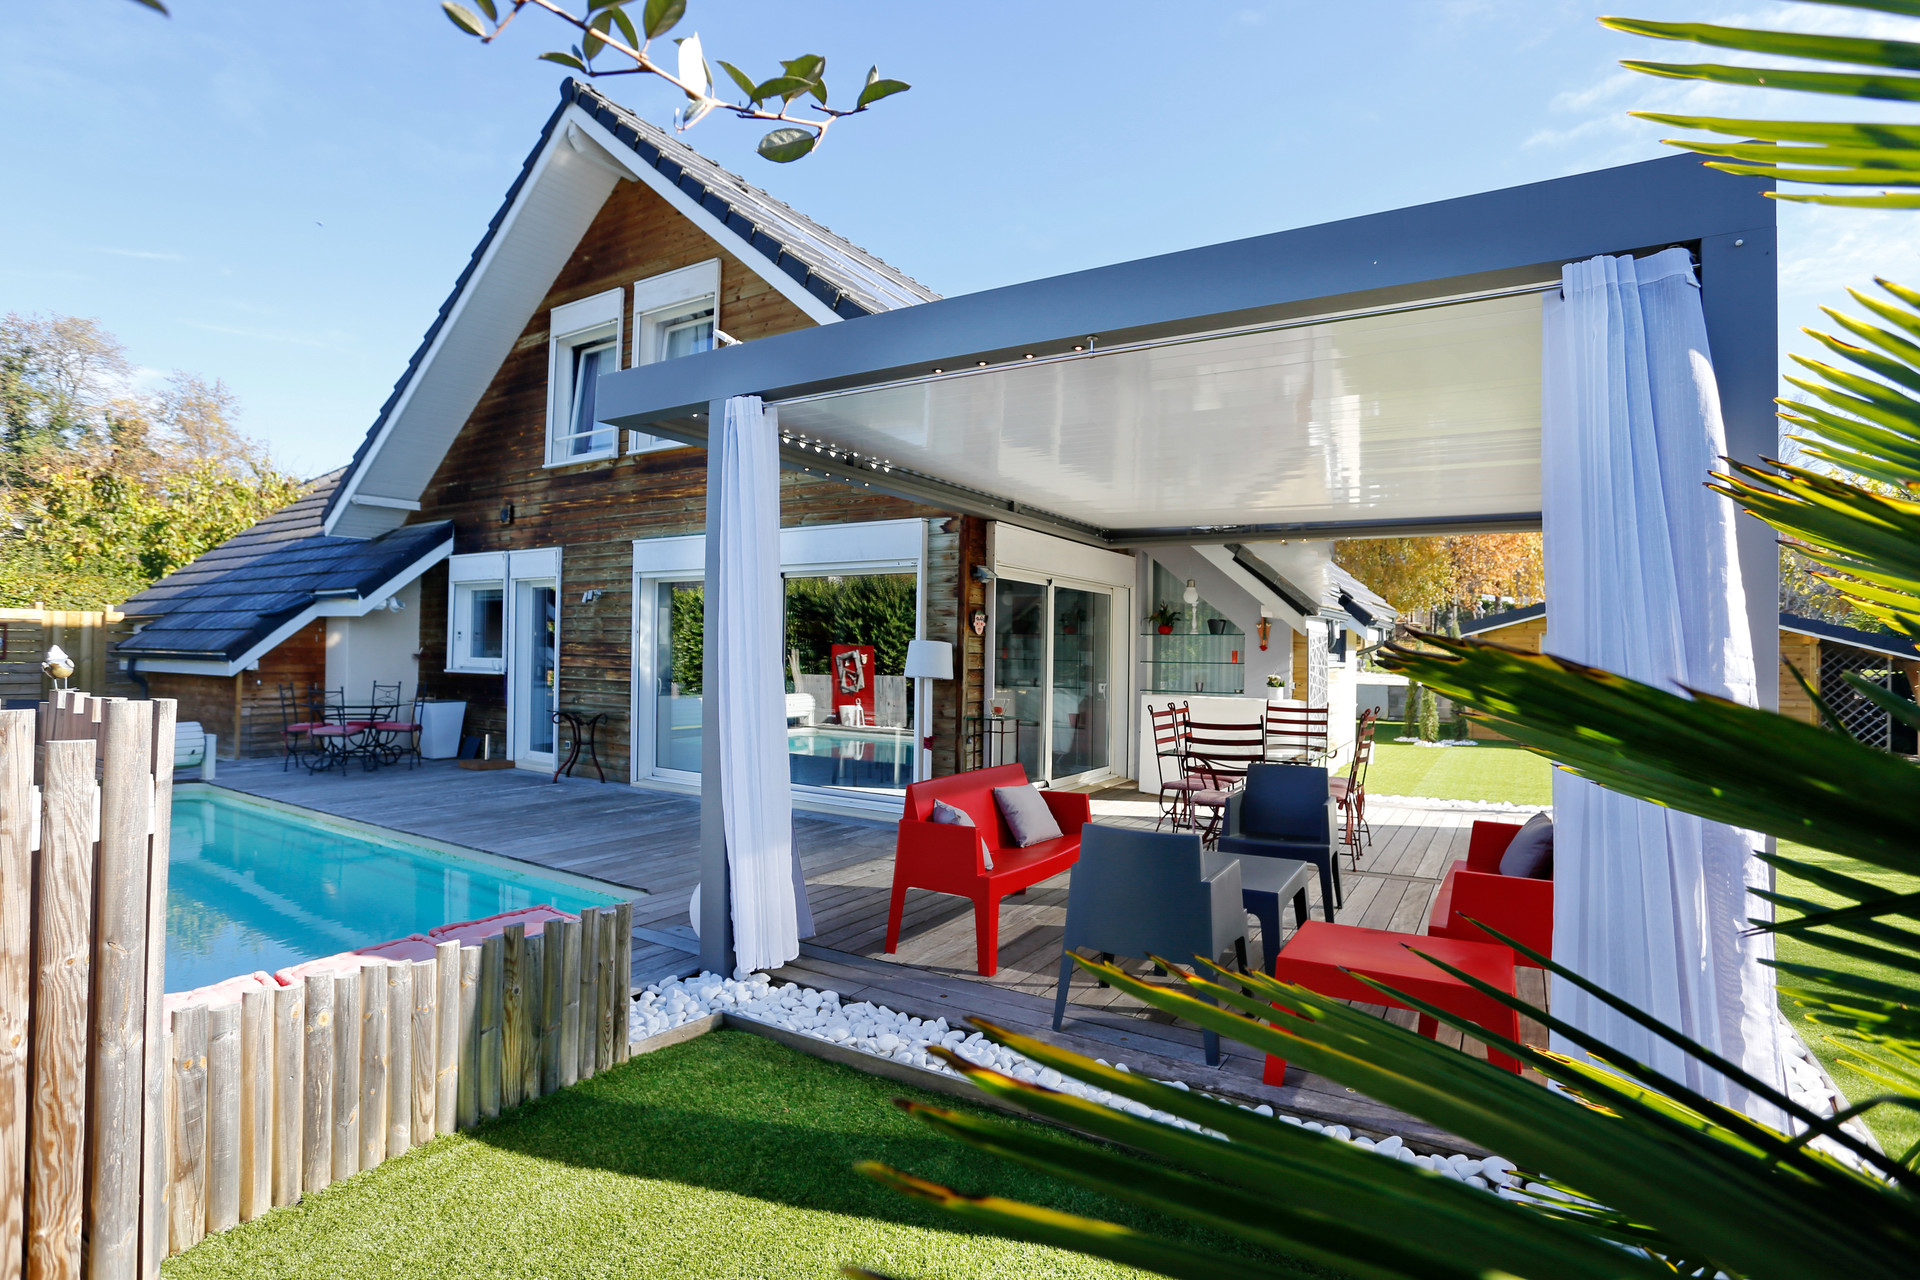 Chambre Bleue Chambery maison avec piscine